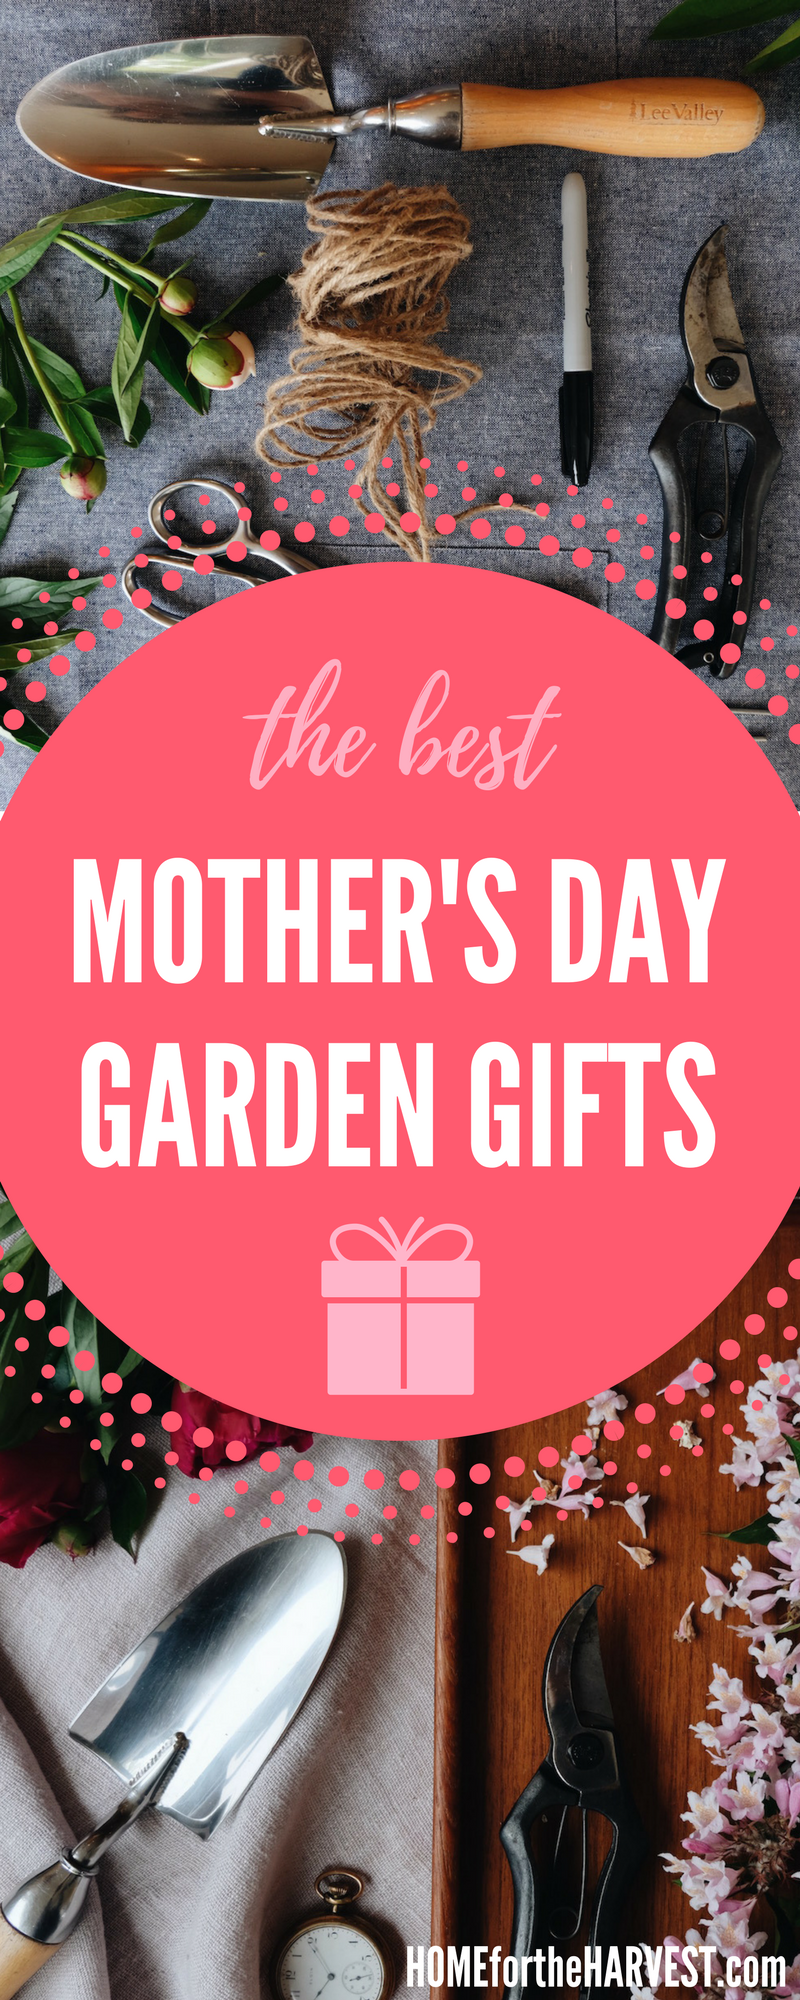 Christmas garden gifts for mom